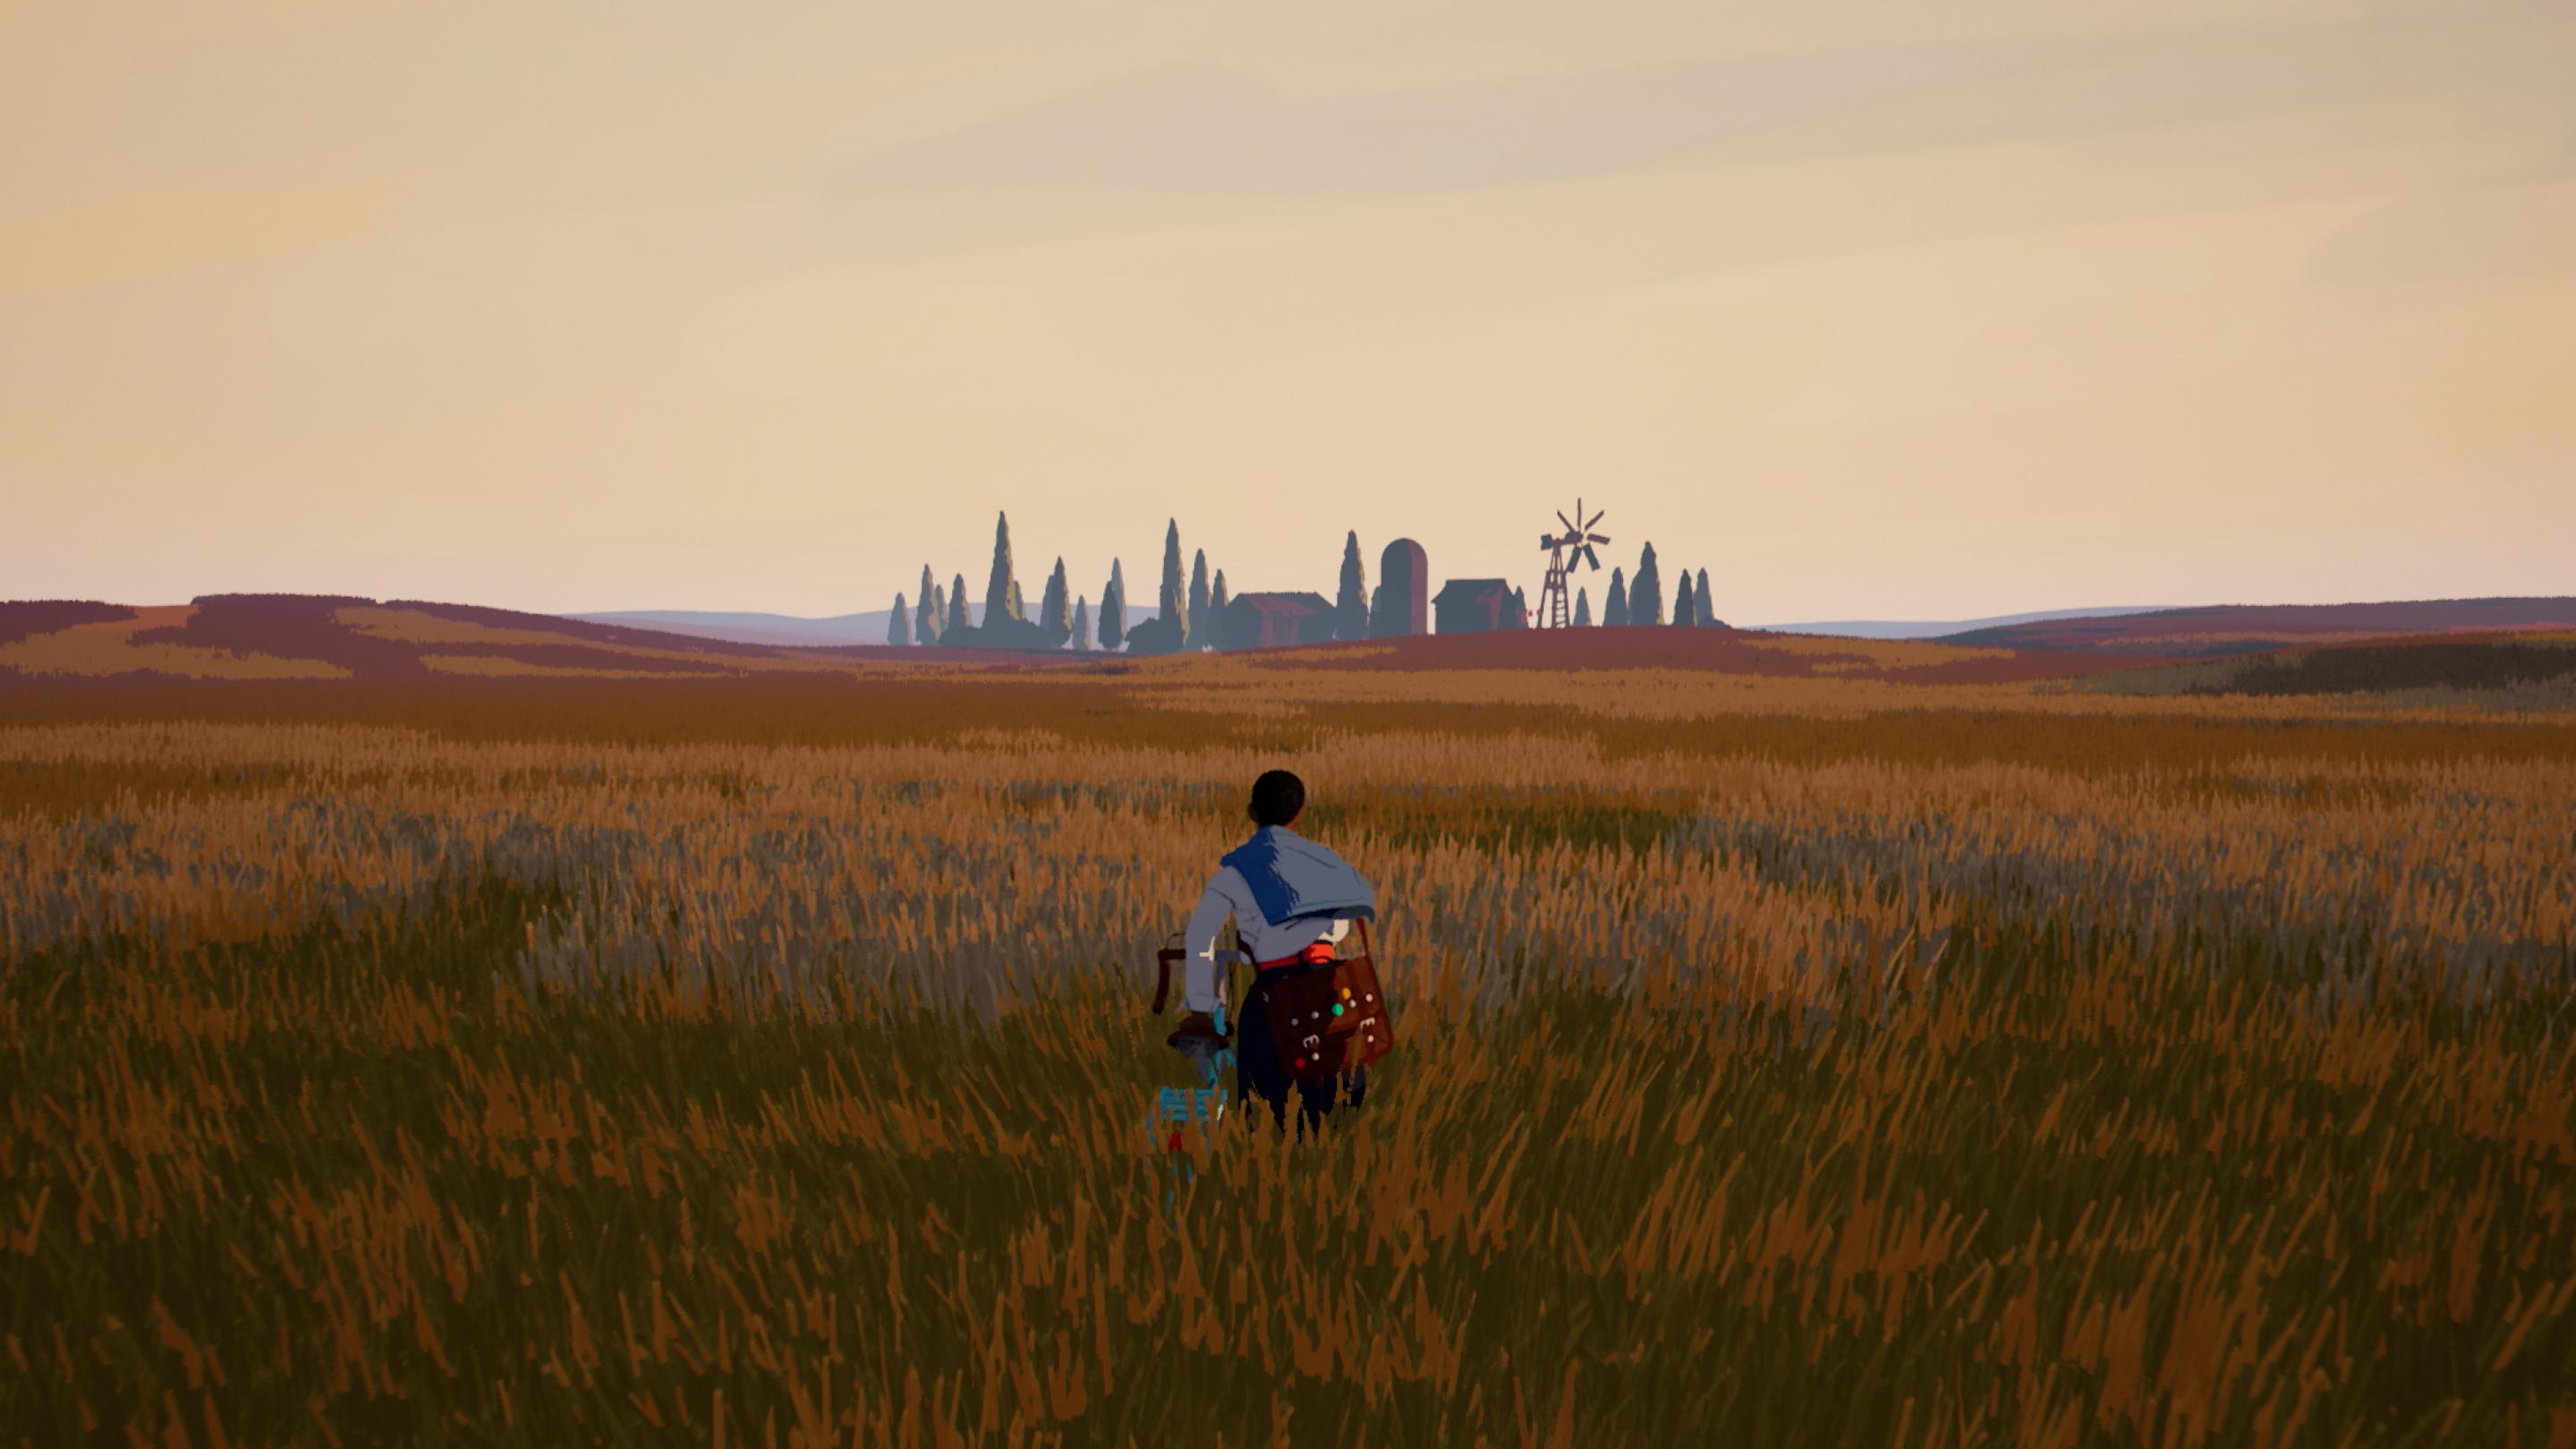 A boy walking through a field in the game Season